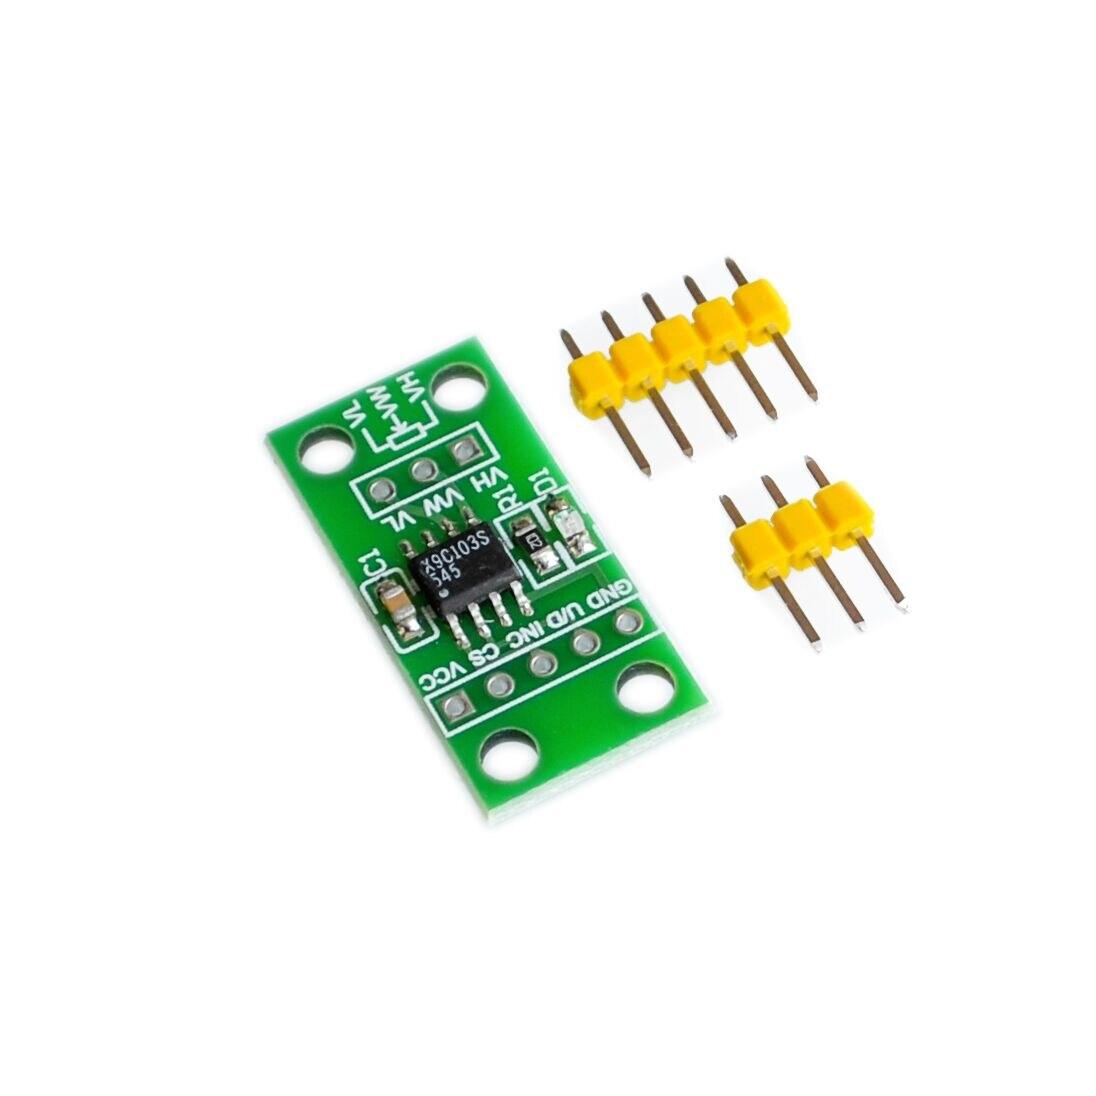 X9C103S Digital Potentiometer Board Module for Arduino DC3V-5V H$YYY